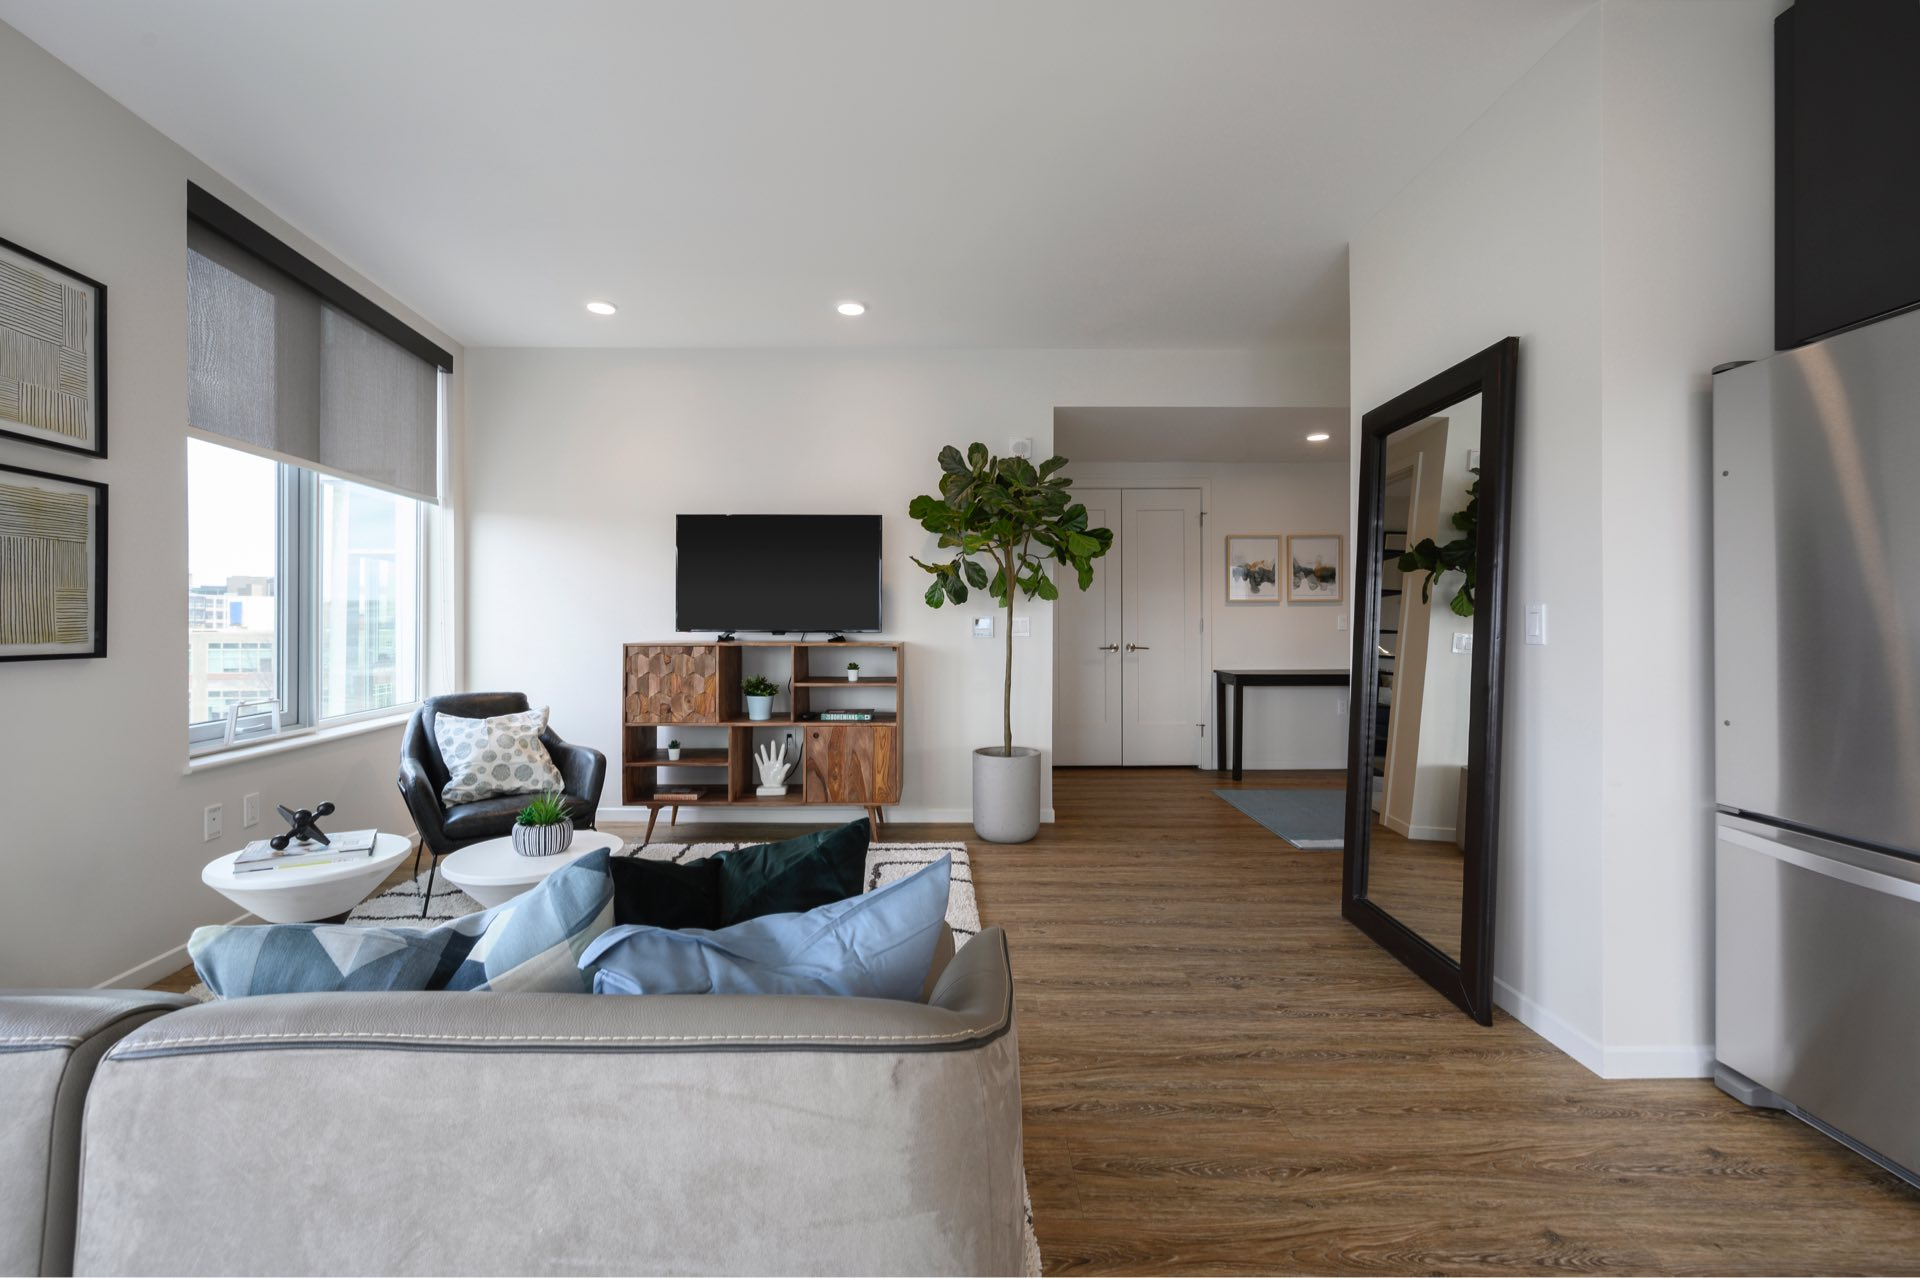 Apartments img 29